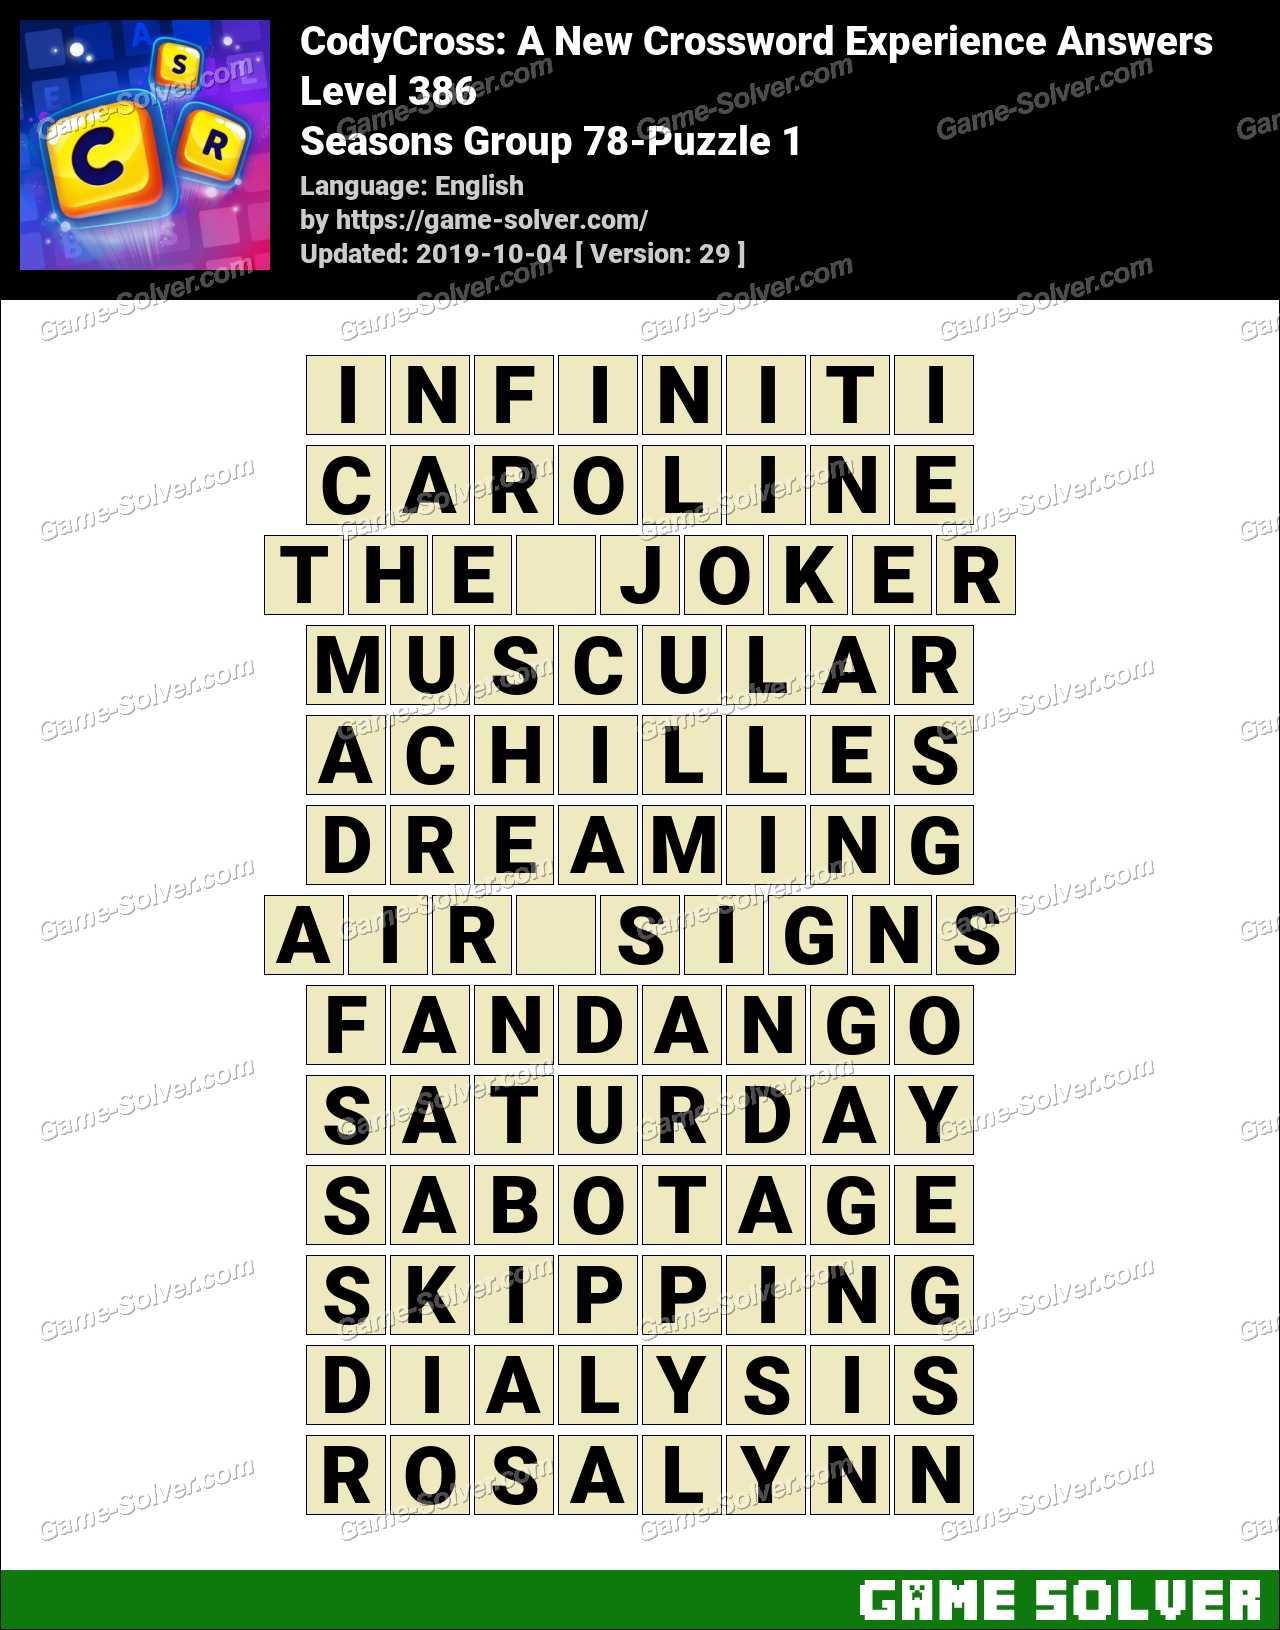 CodyCross Seasons Group 78-Puzzle 1 Answers